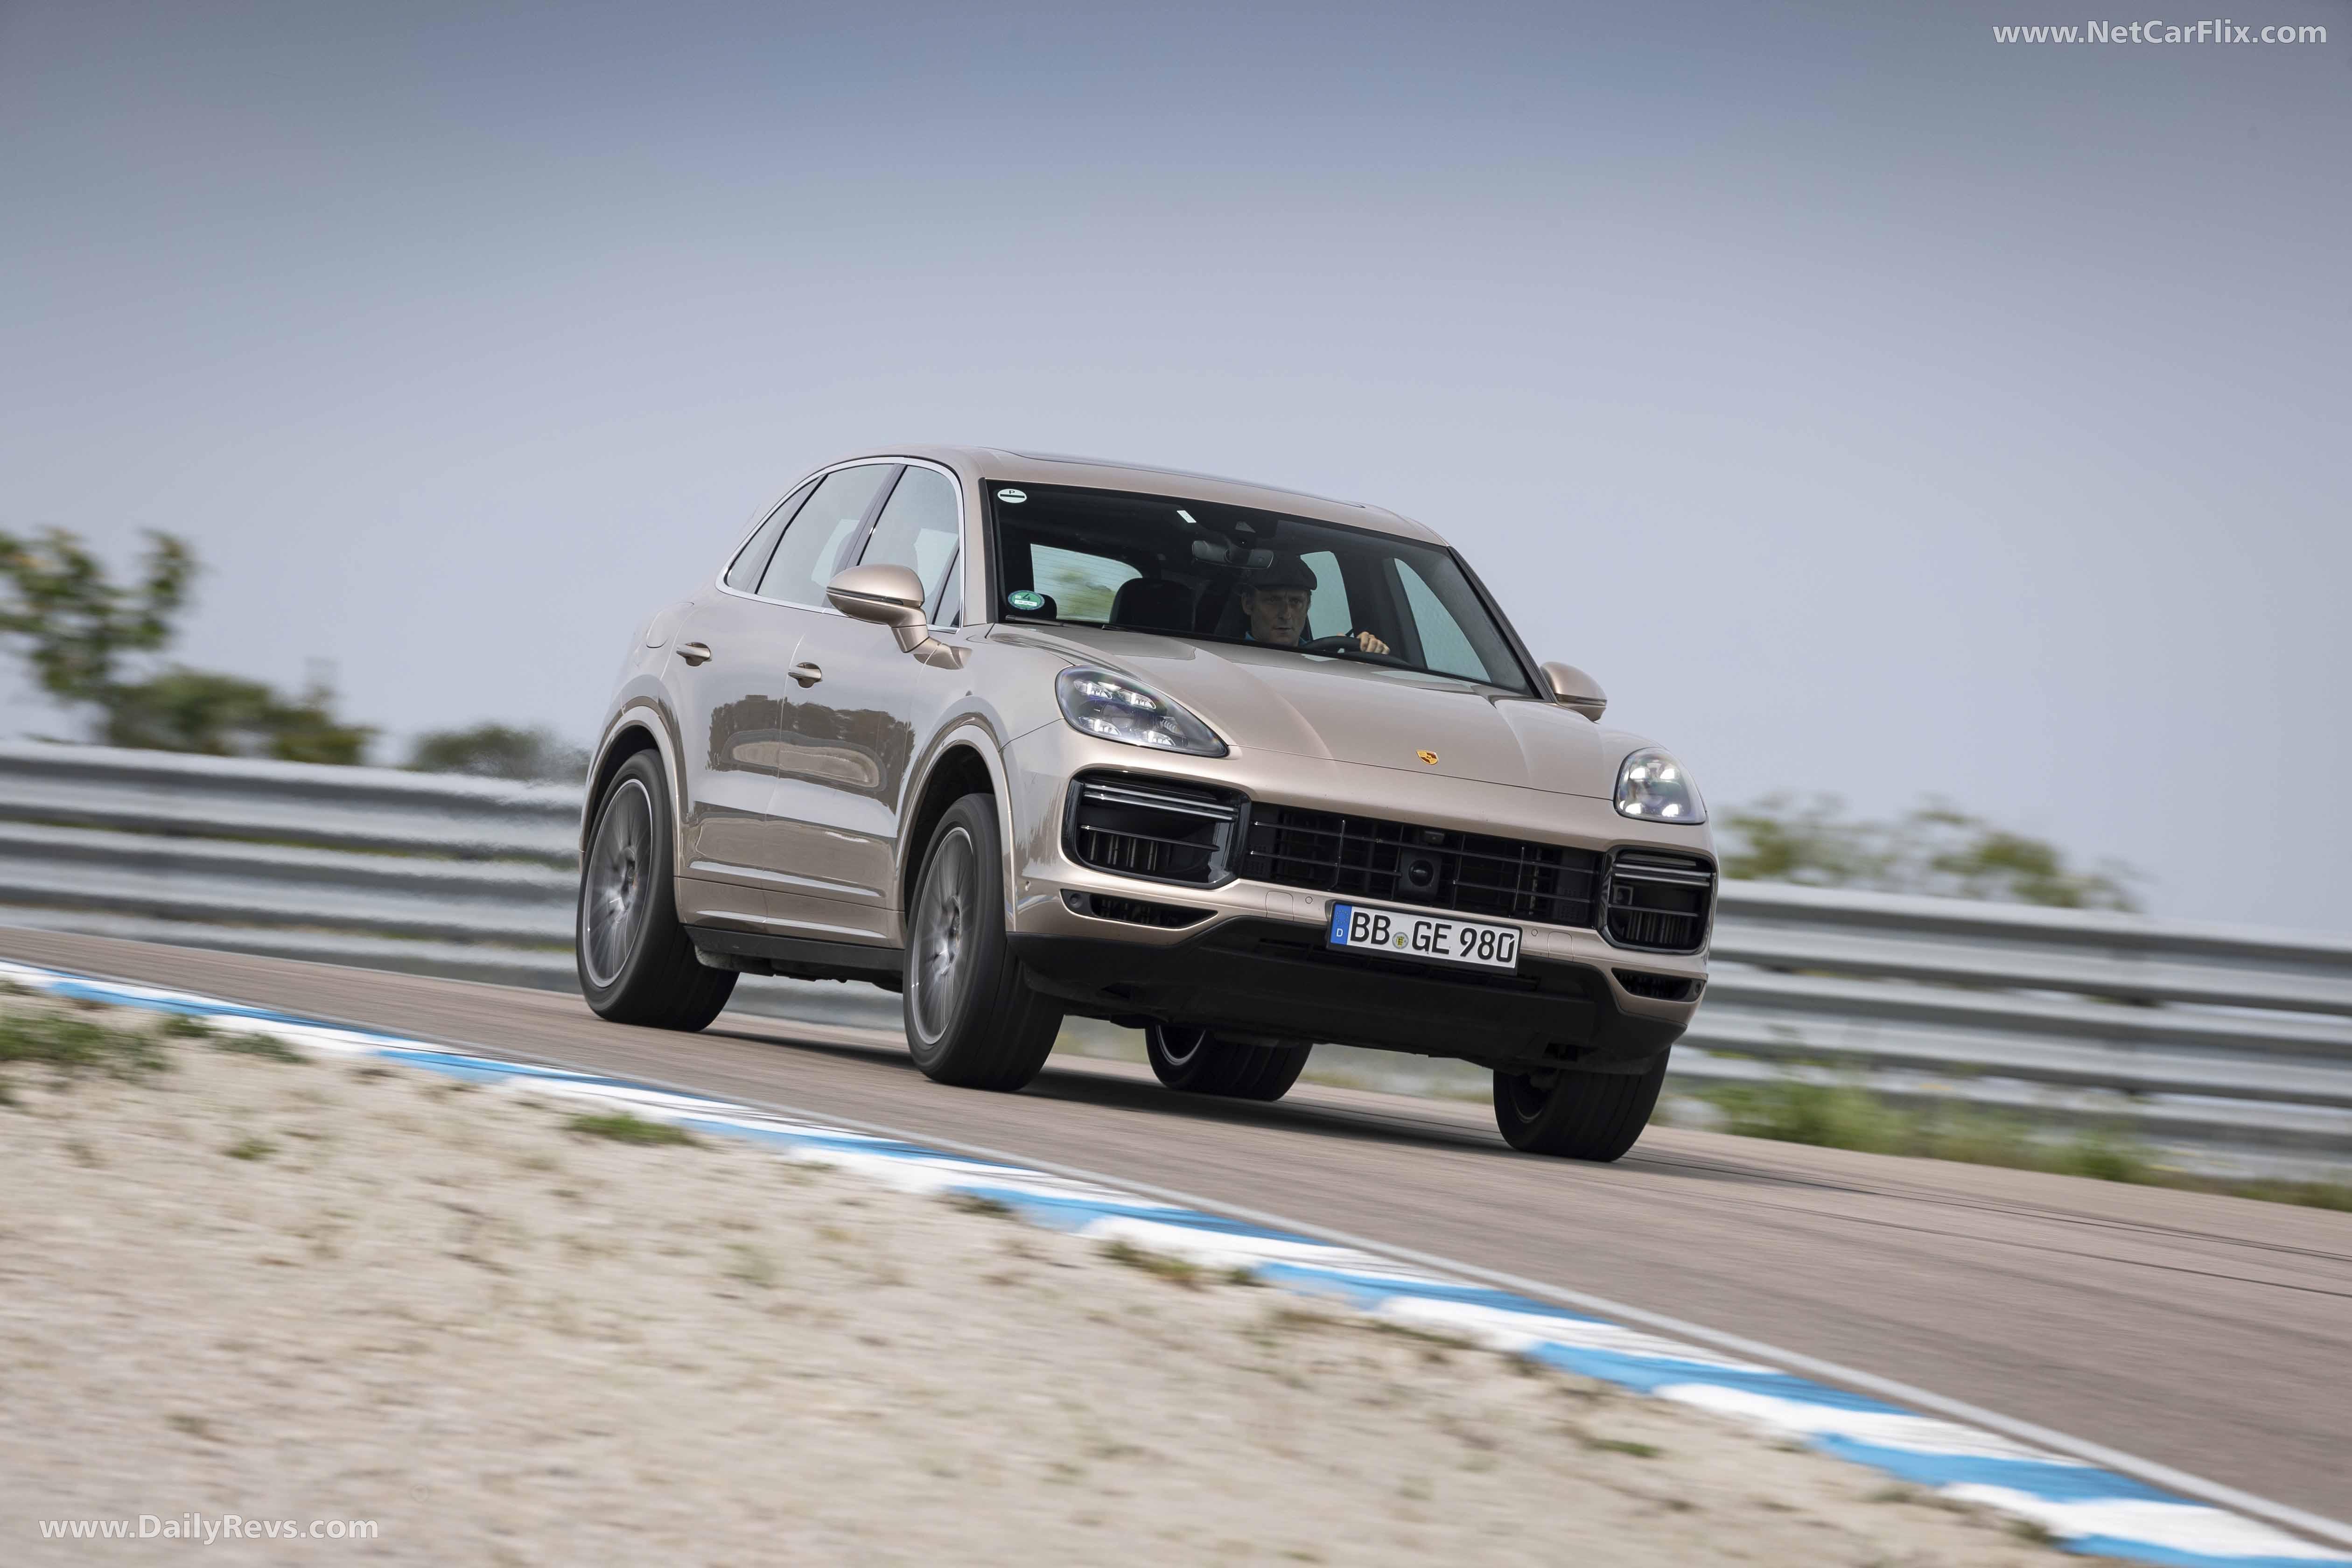 2020 Porsche Cayenne Turbo S E Hybrid Dailyrevs